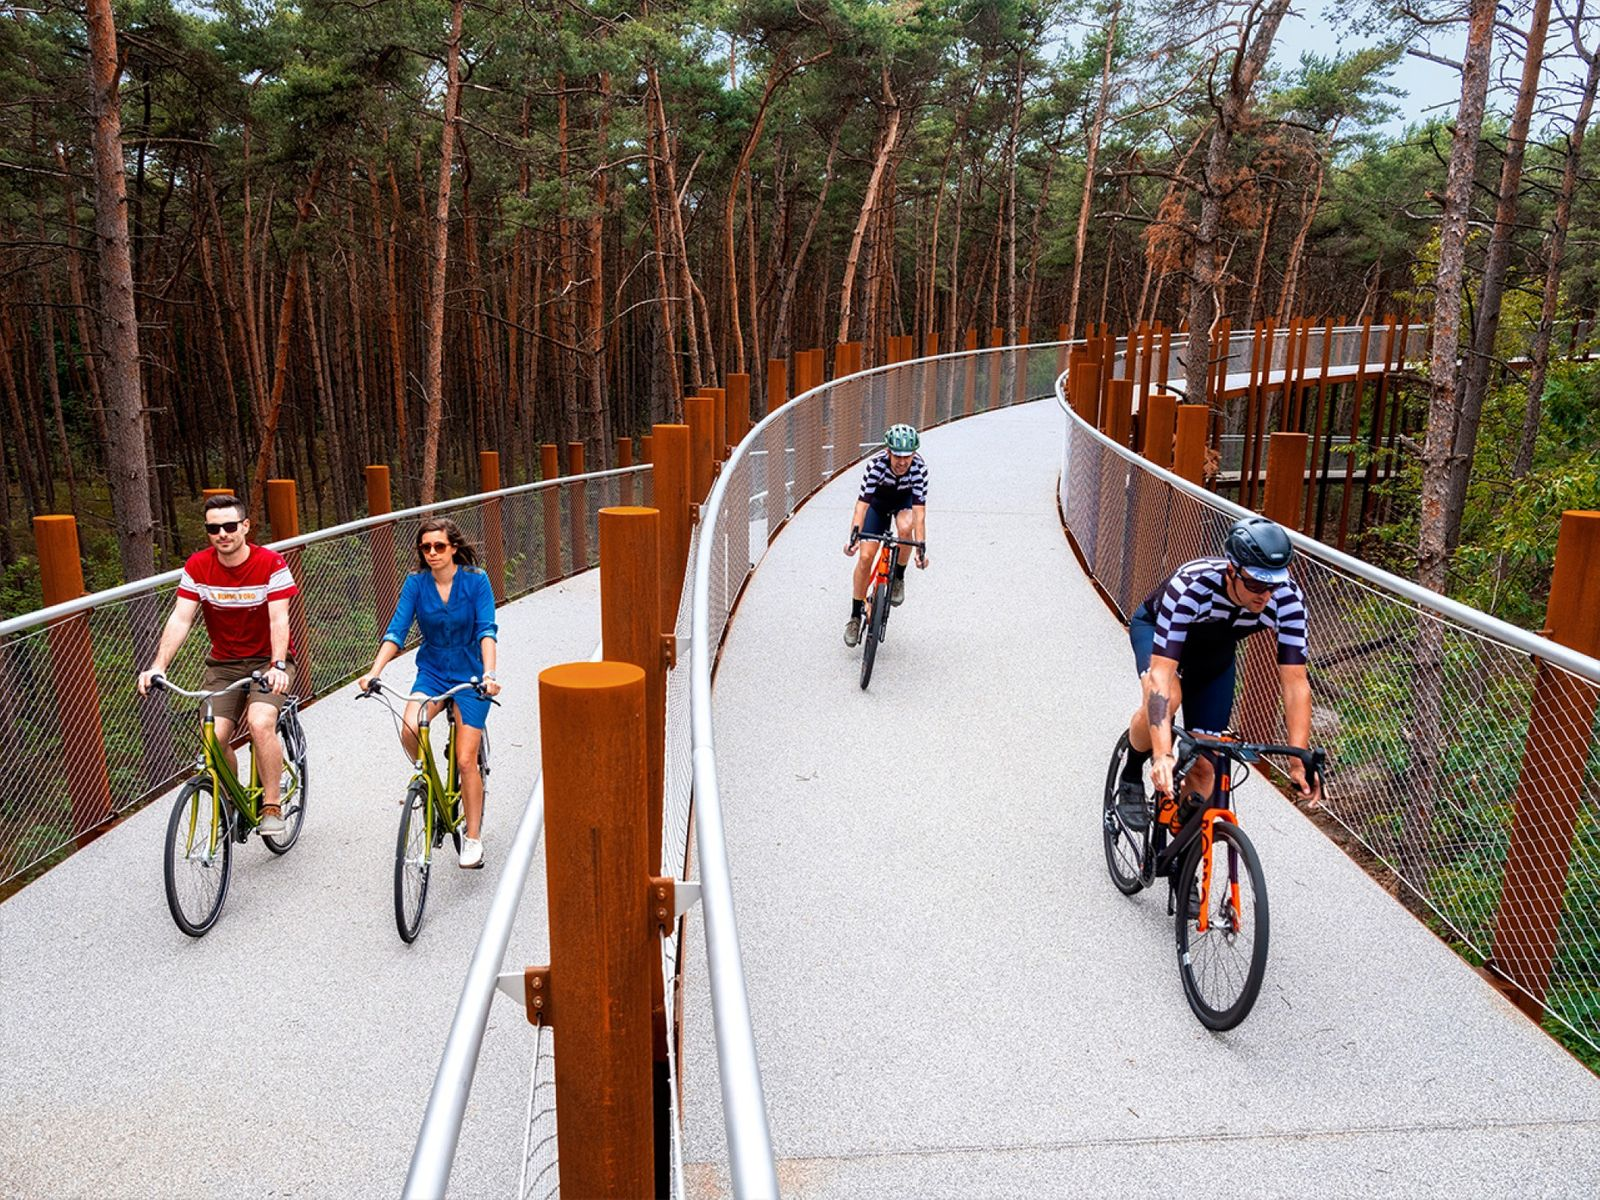 Dezeen Awards 2020 Cycling through the Trees by Visit Limburg